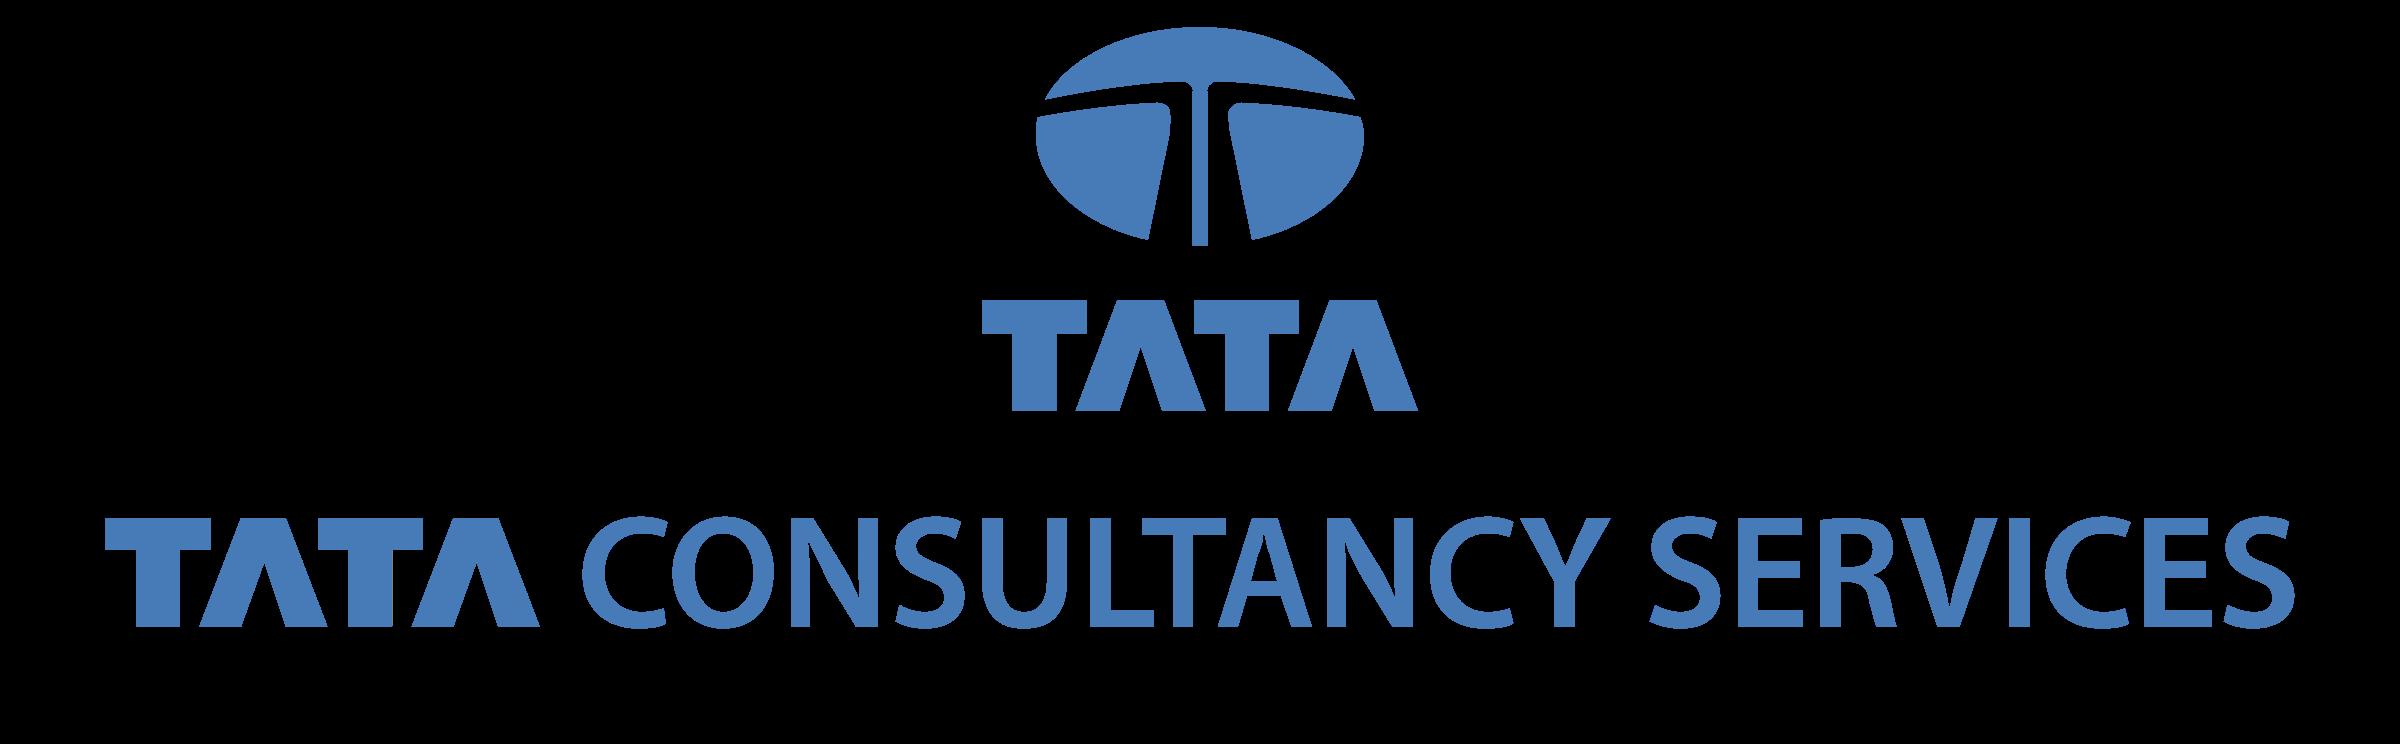 tata-consultancy-services-logo